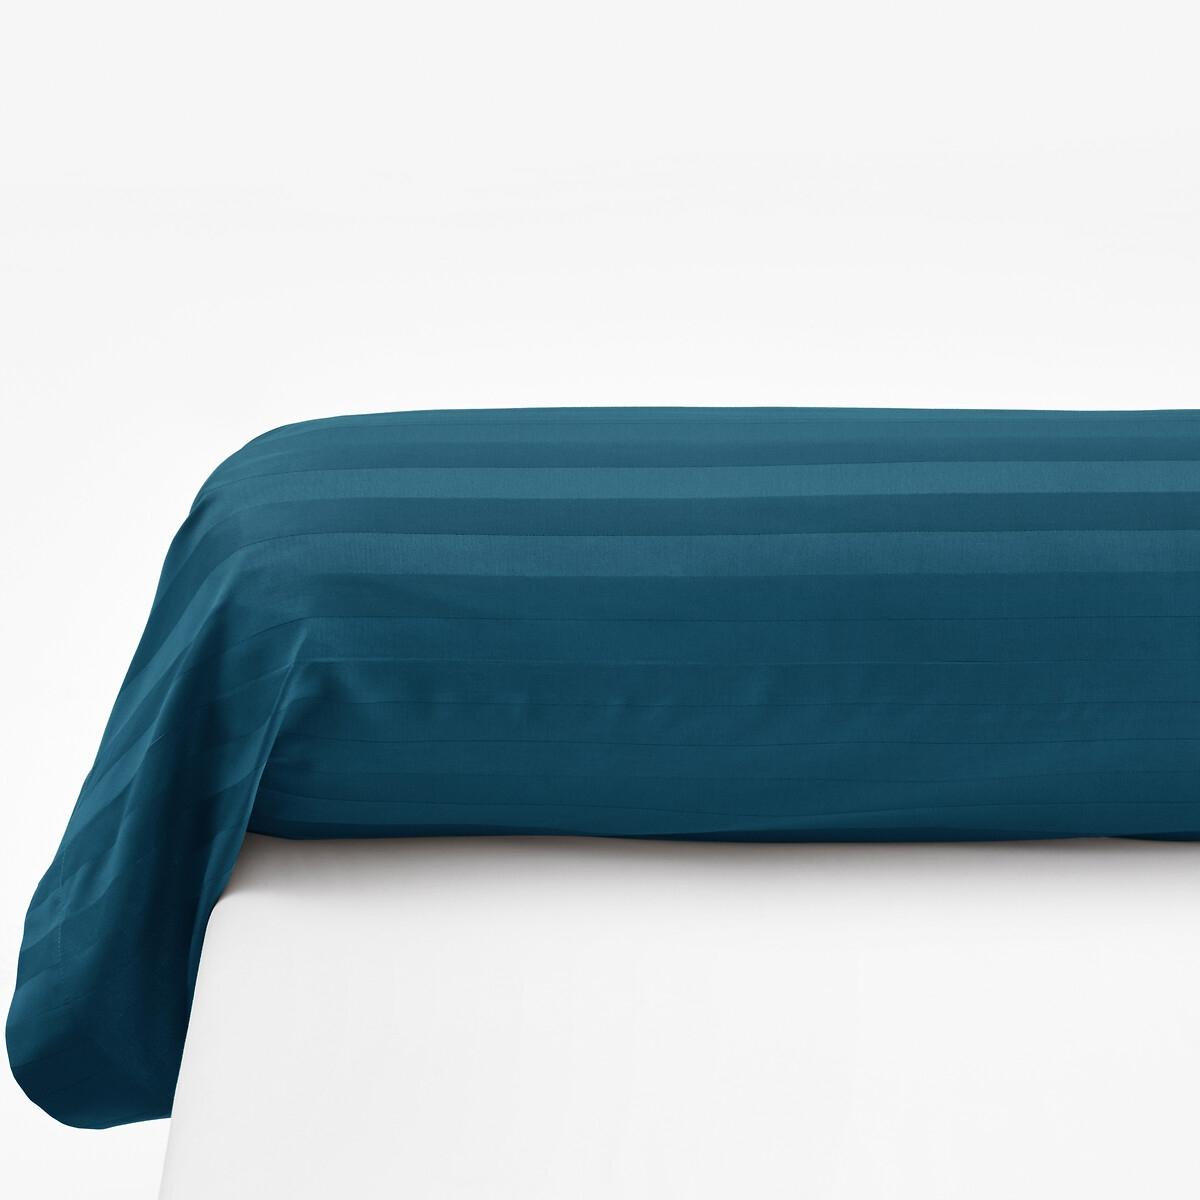 наволочки на подушку и наволочка на подушку валик из хлопка richmond Наволочка LaRedoute На подушку-валик из хлопкового сатина в полоску 85 x 185 см синий